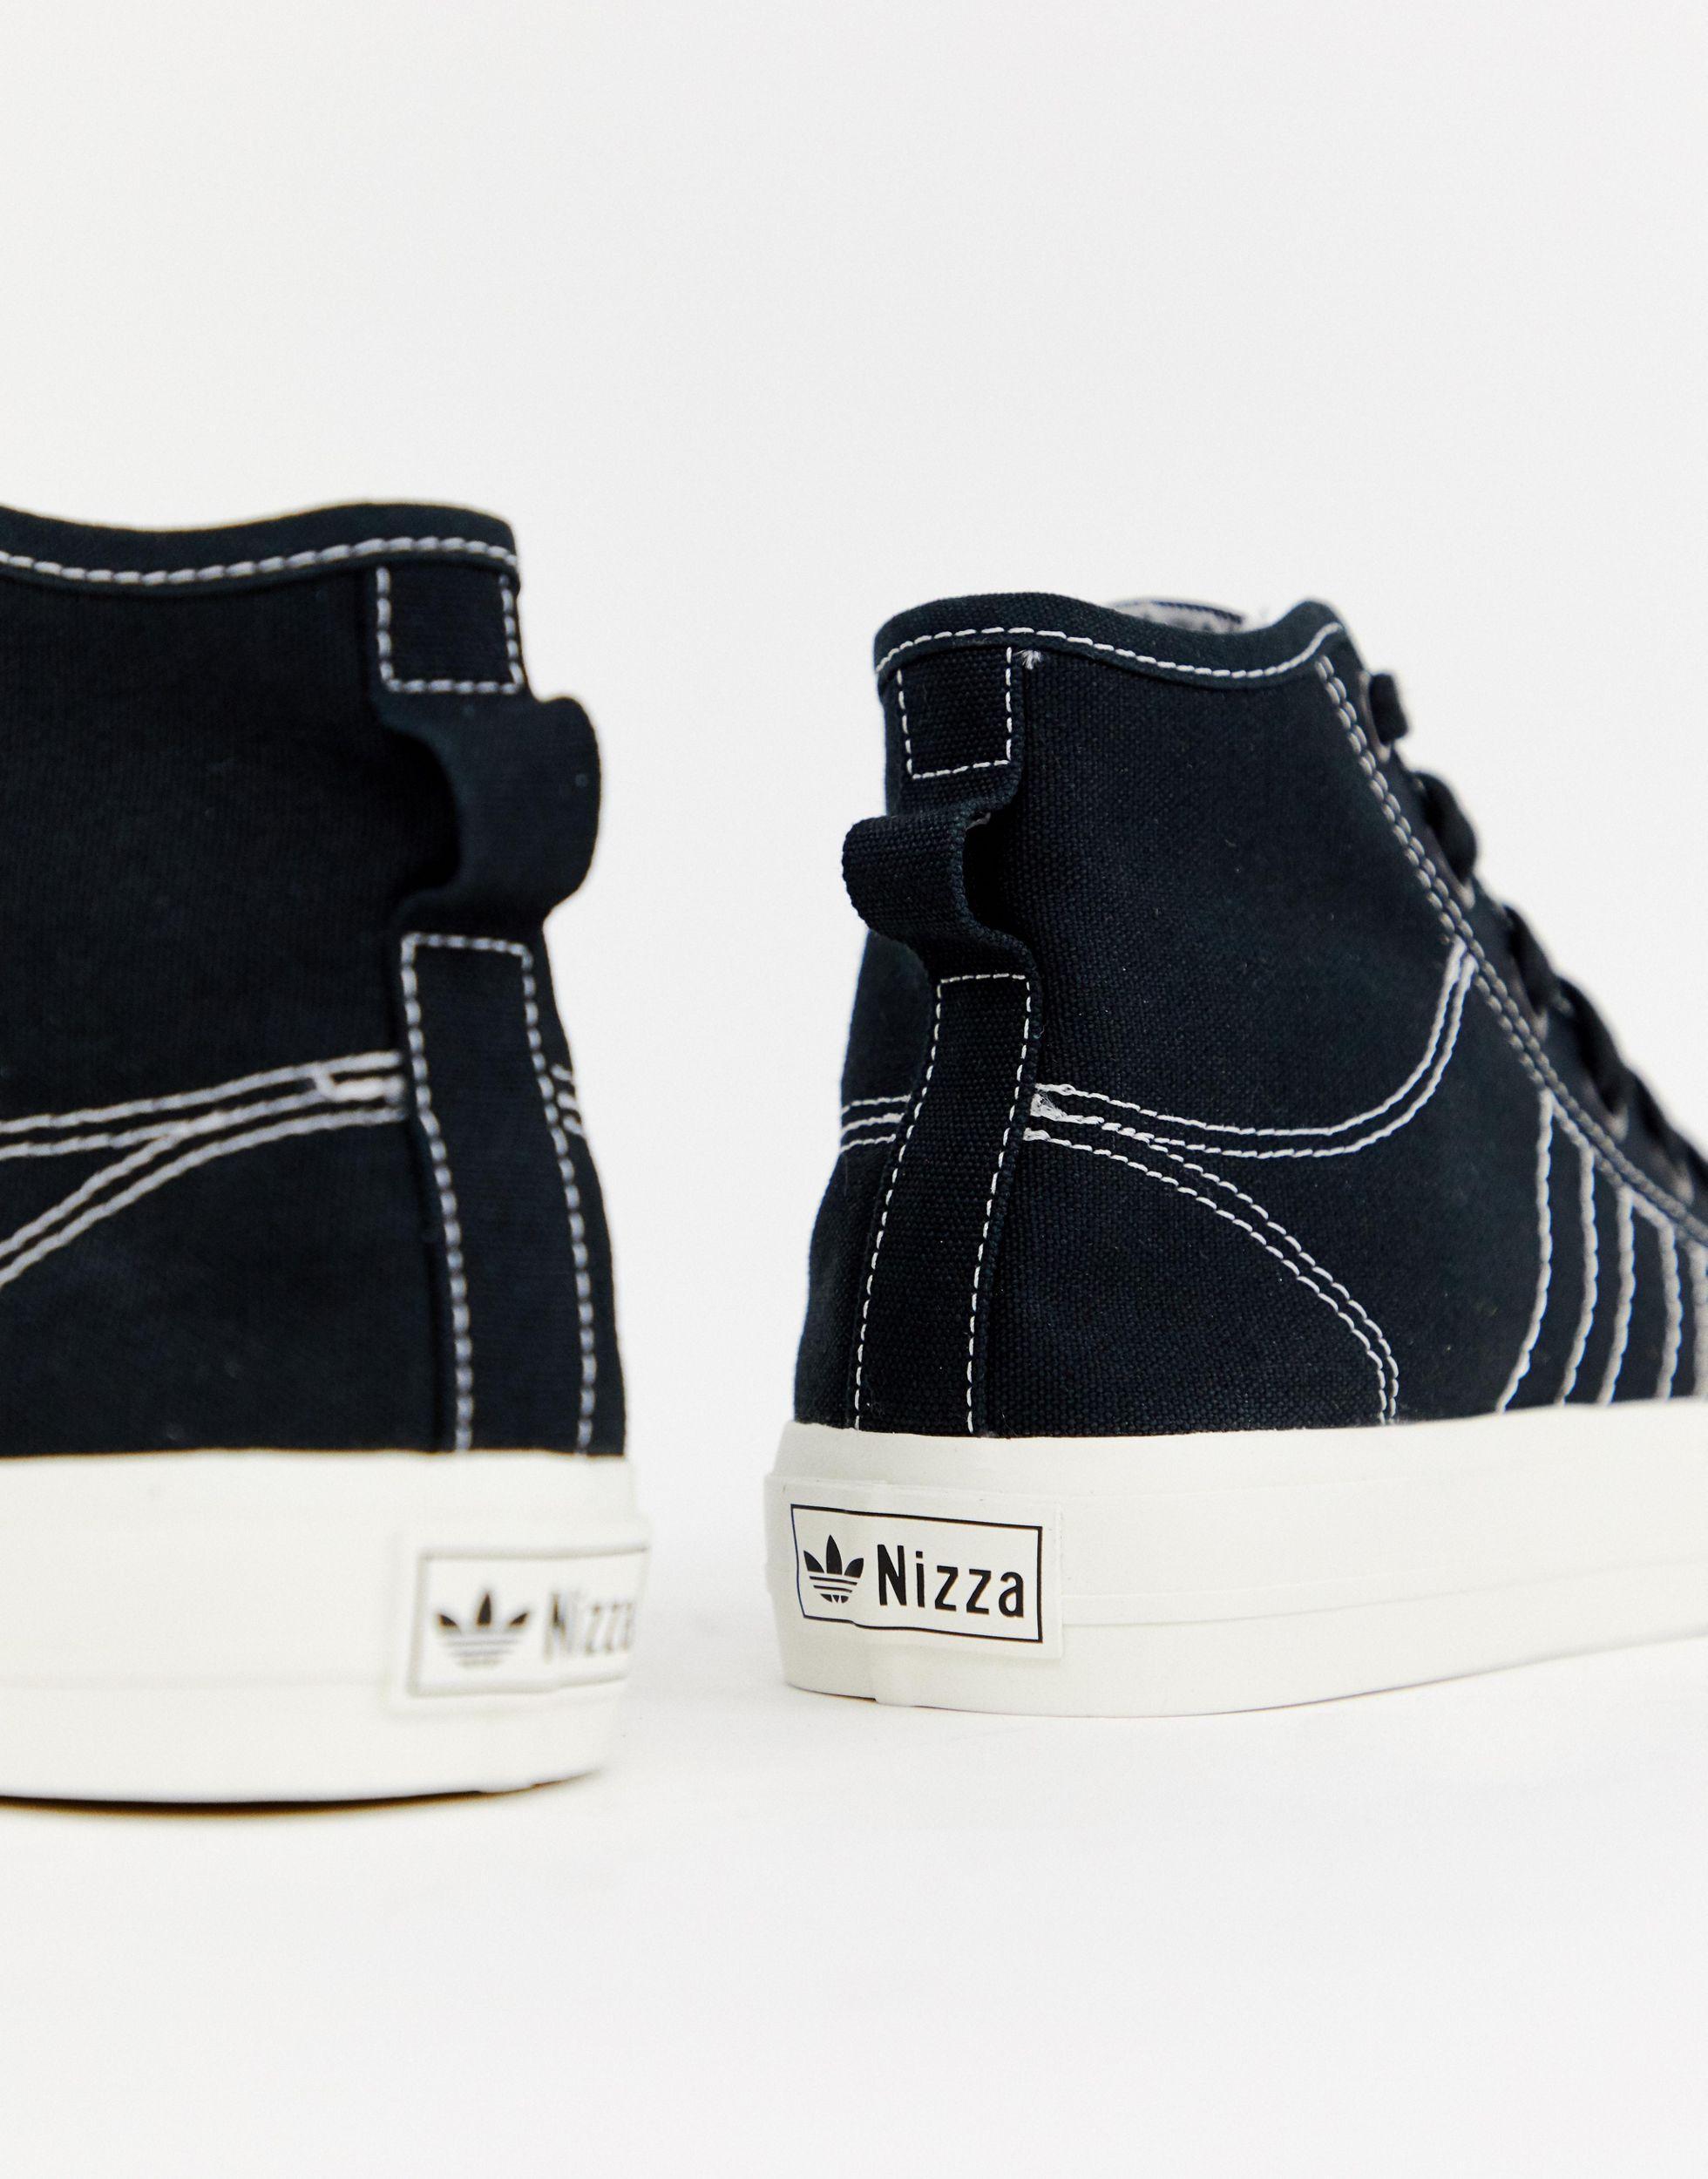 Black High Top Nizza Sneakers - Lyst